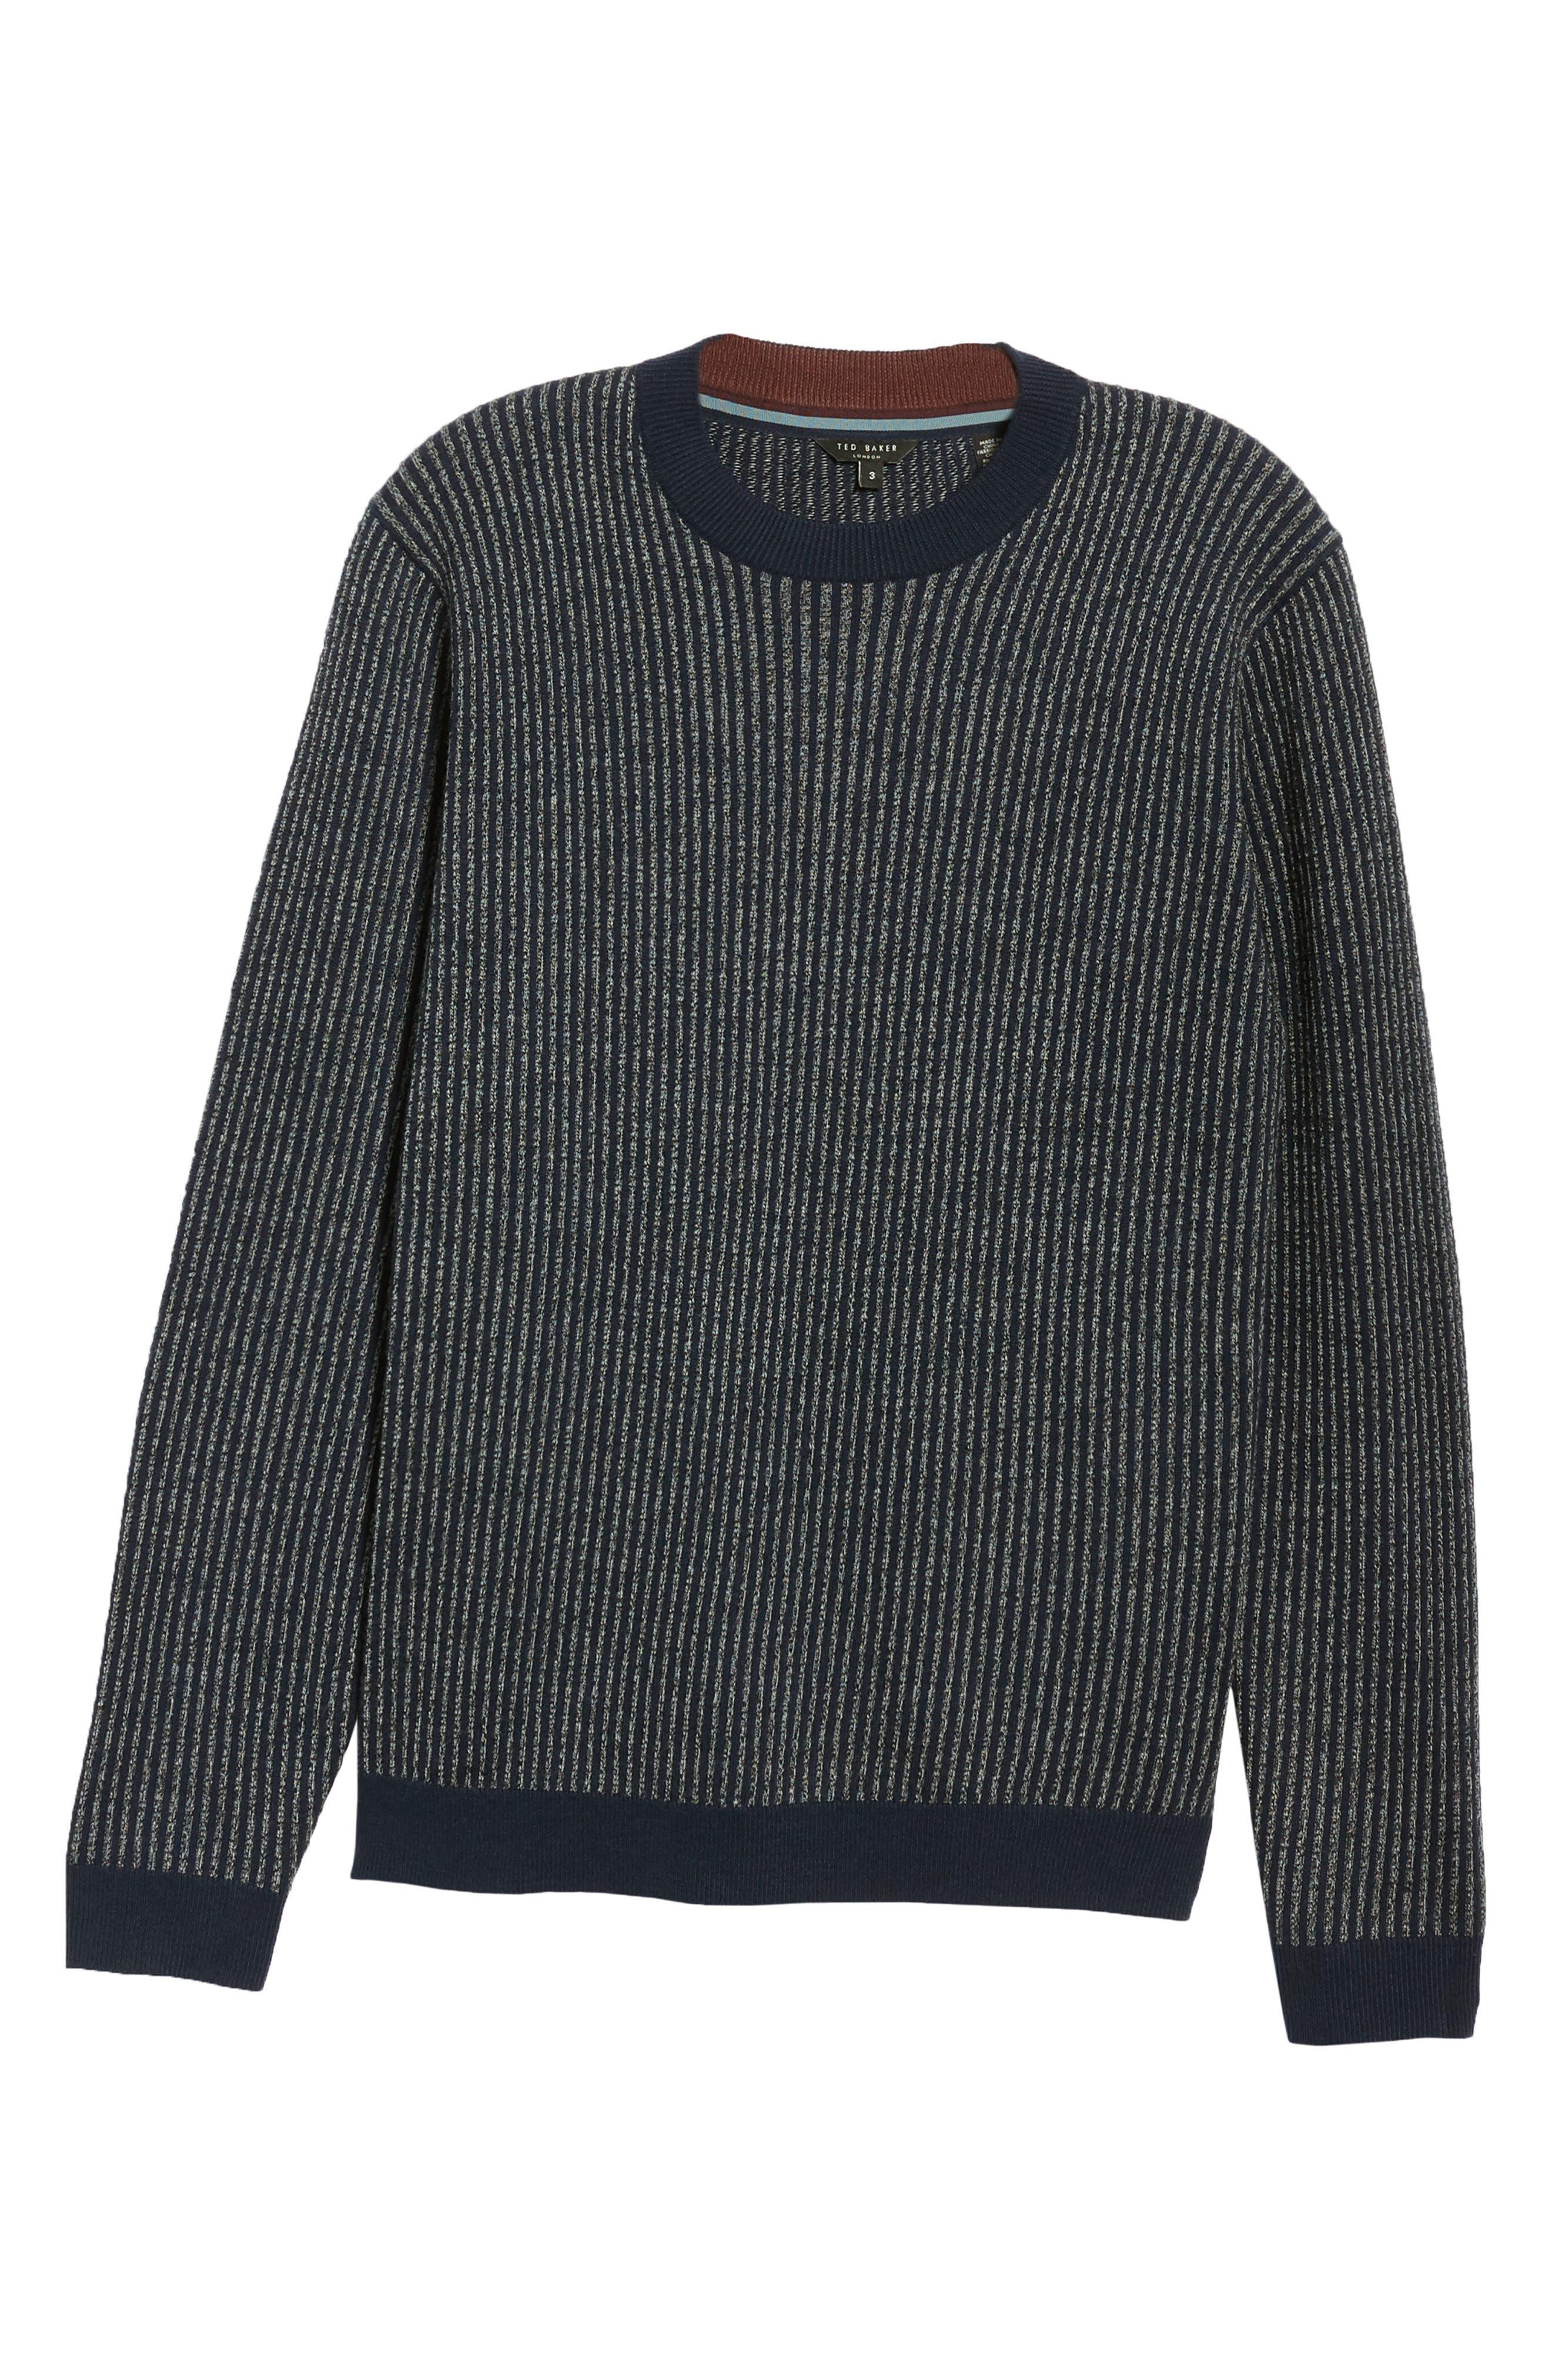 Jinxitt Crewneck Sweater,                             Alternate thumbnail 6, color,                             NAVY